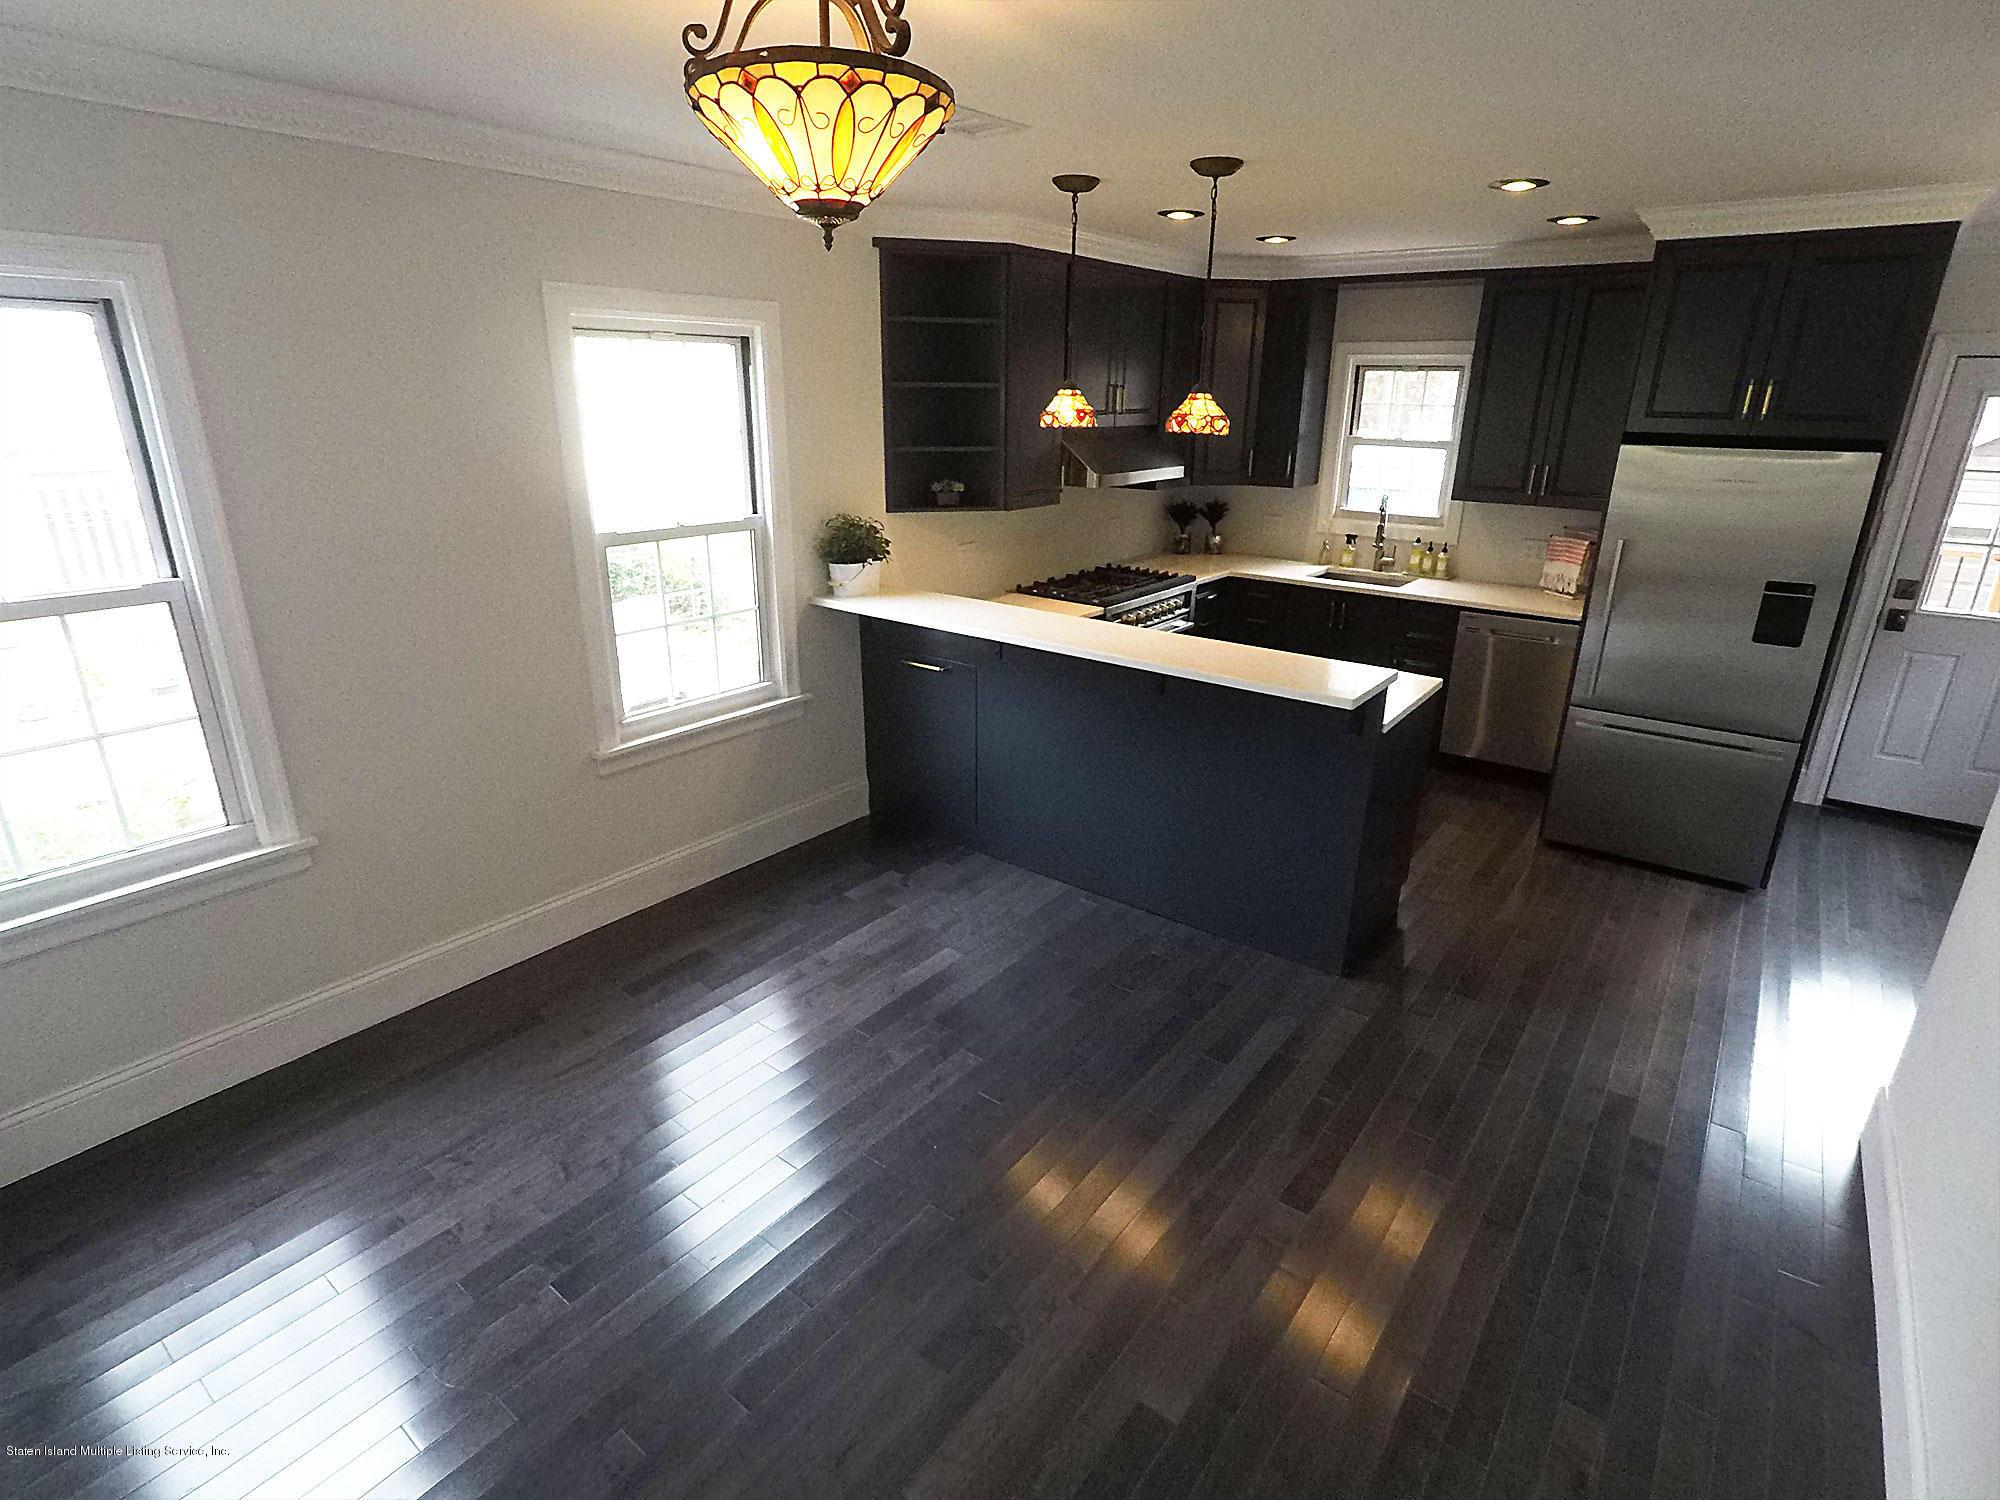 Single Family - Detached 115 Woodbine Avenue  Staten Island, NY 10314, MLS-1123689-17